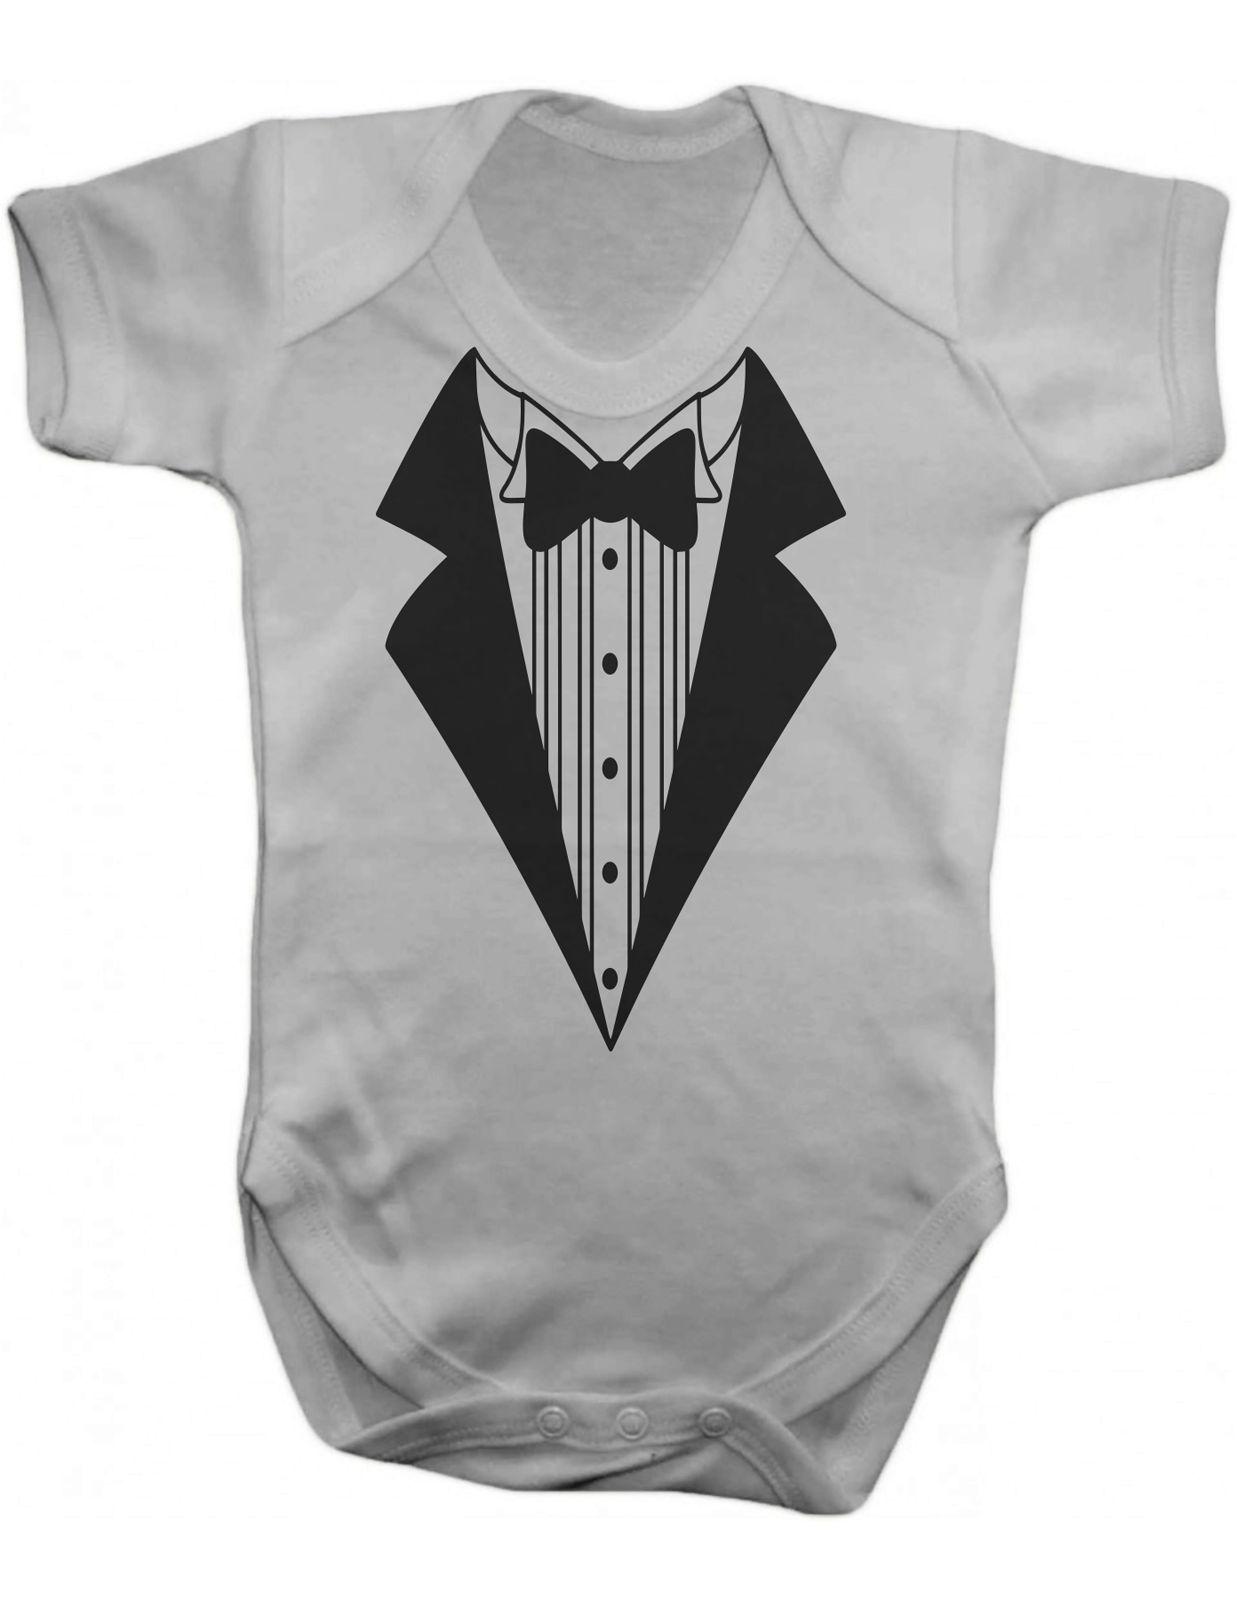 Vest,Baby Grow,Romper,Gift,Baby Clothes,Bodysuit 100/% Cotton Pineapple